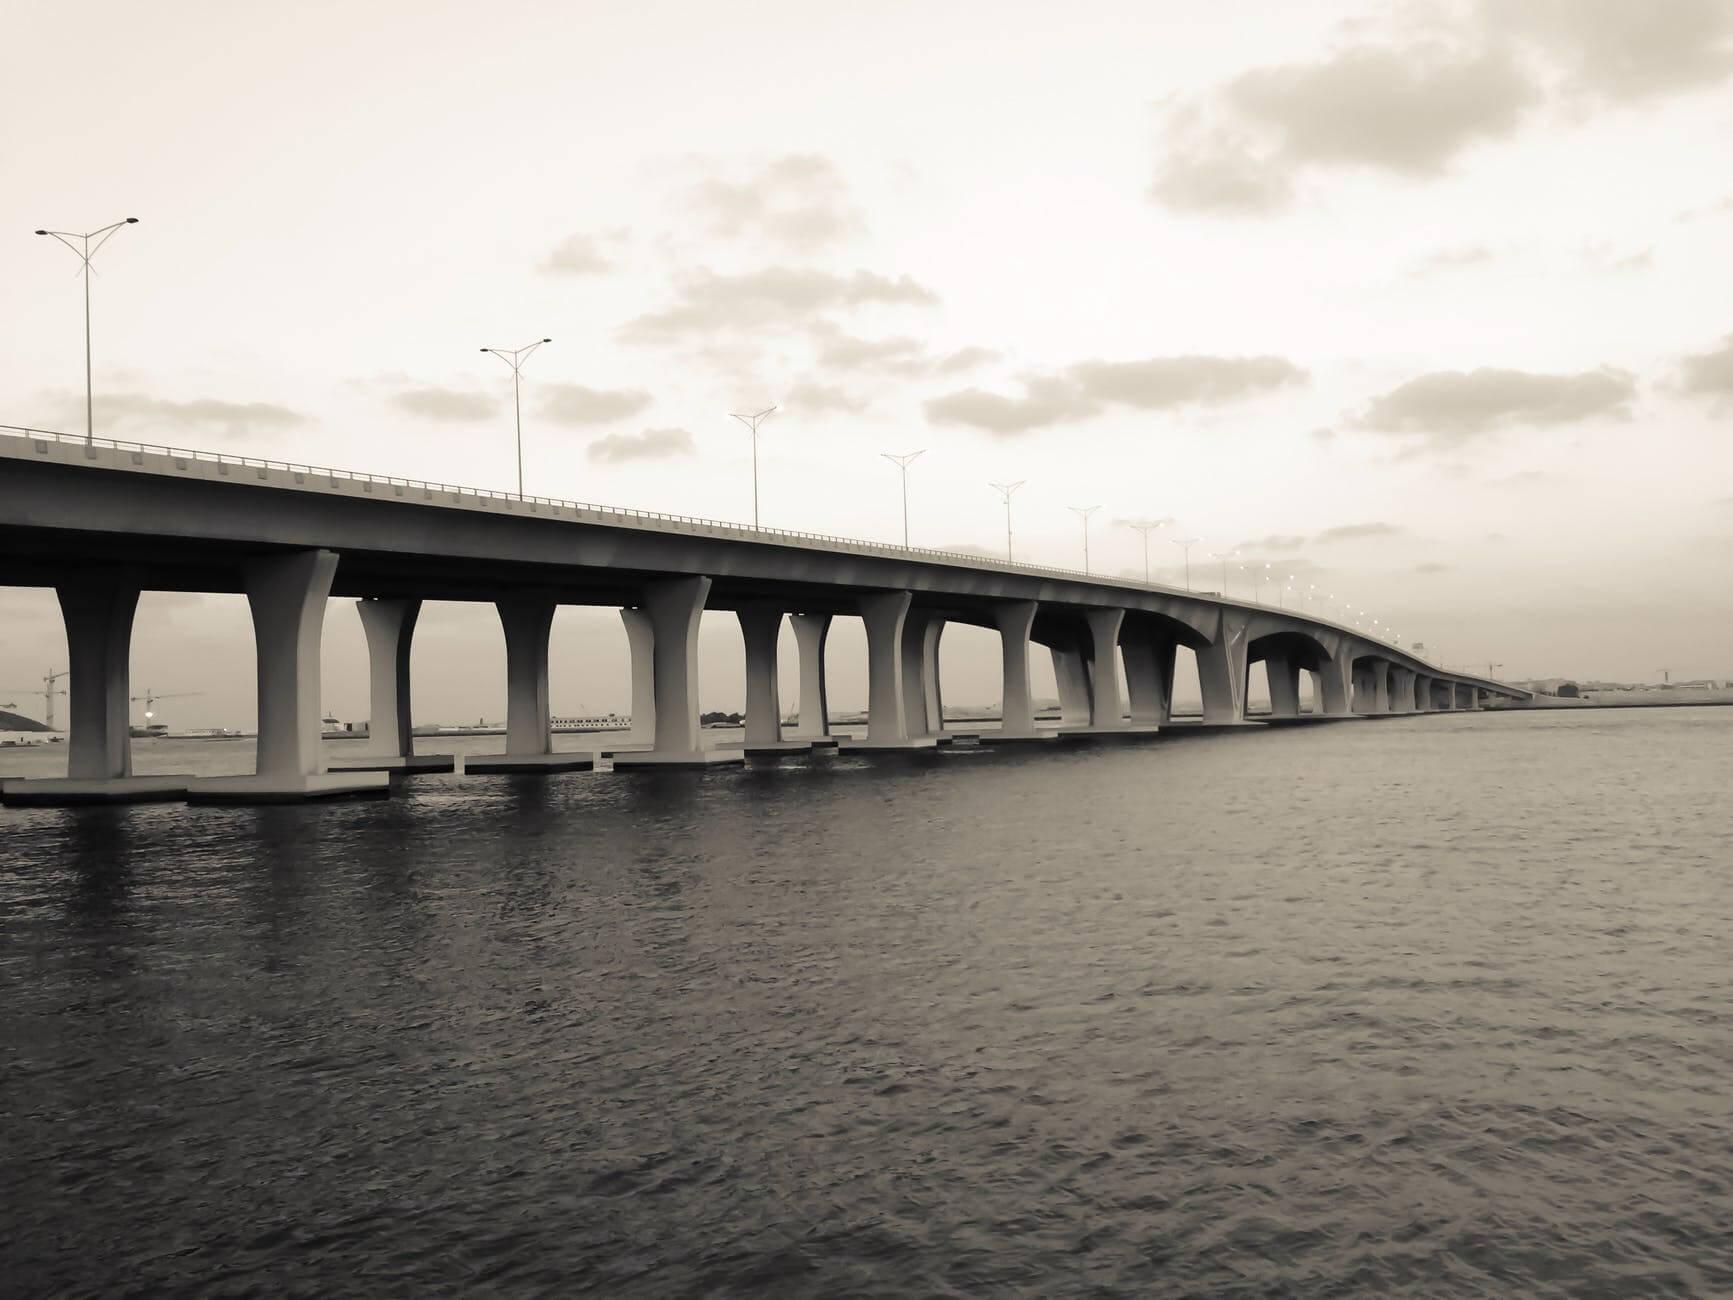 герметизация мост фото